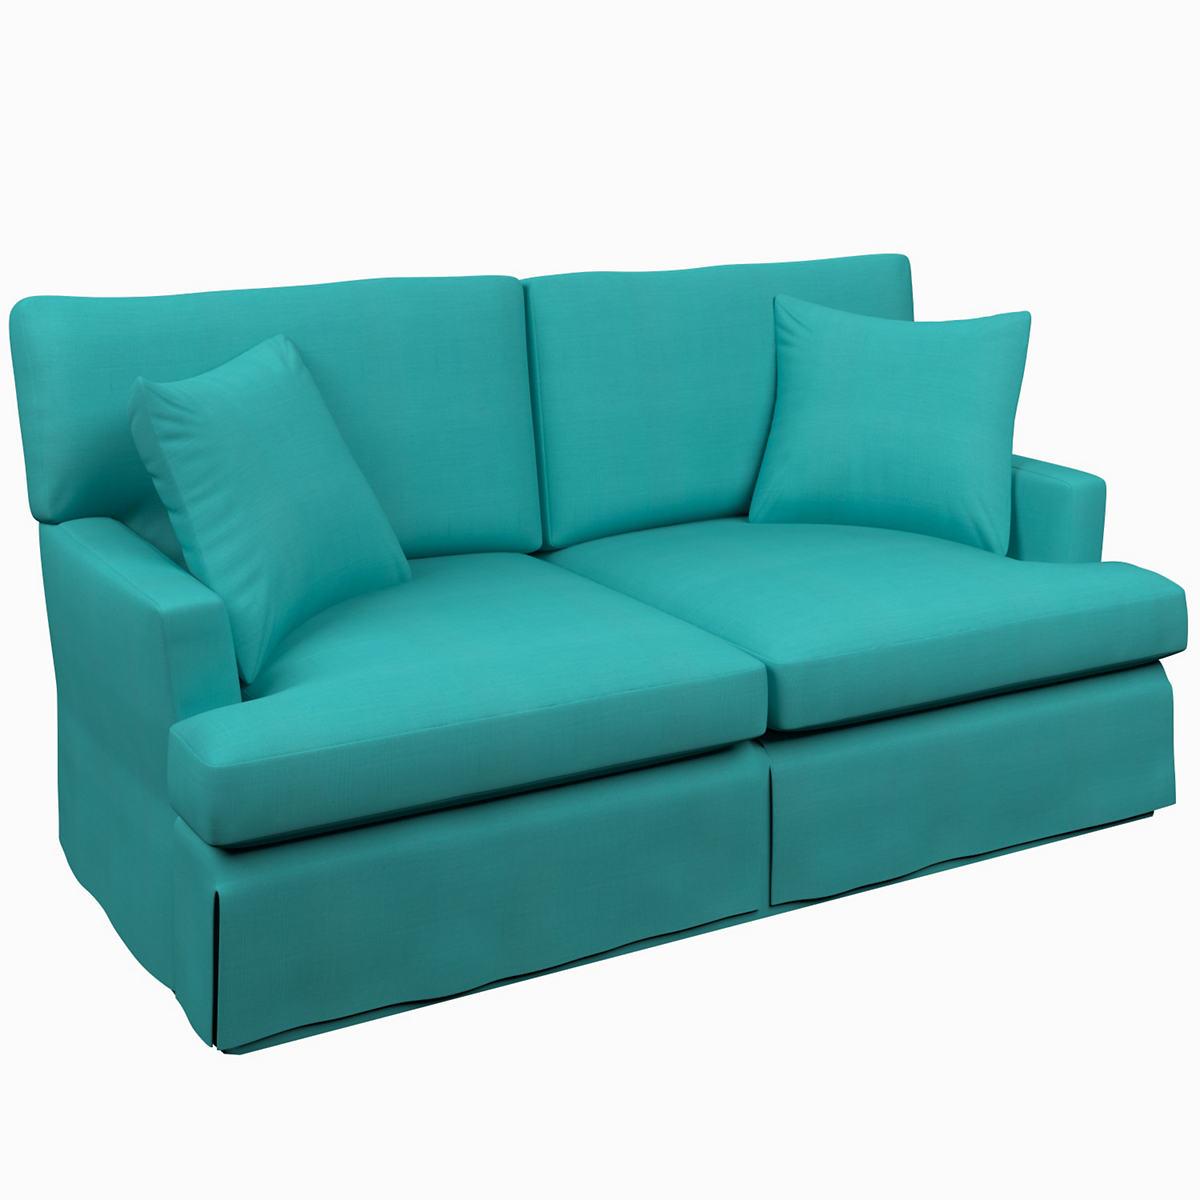 Estate Linen Turquoise Saybrook 2 Seater Slipcovered Sofa